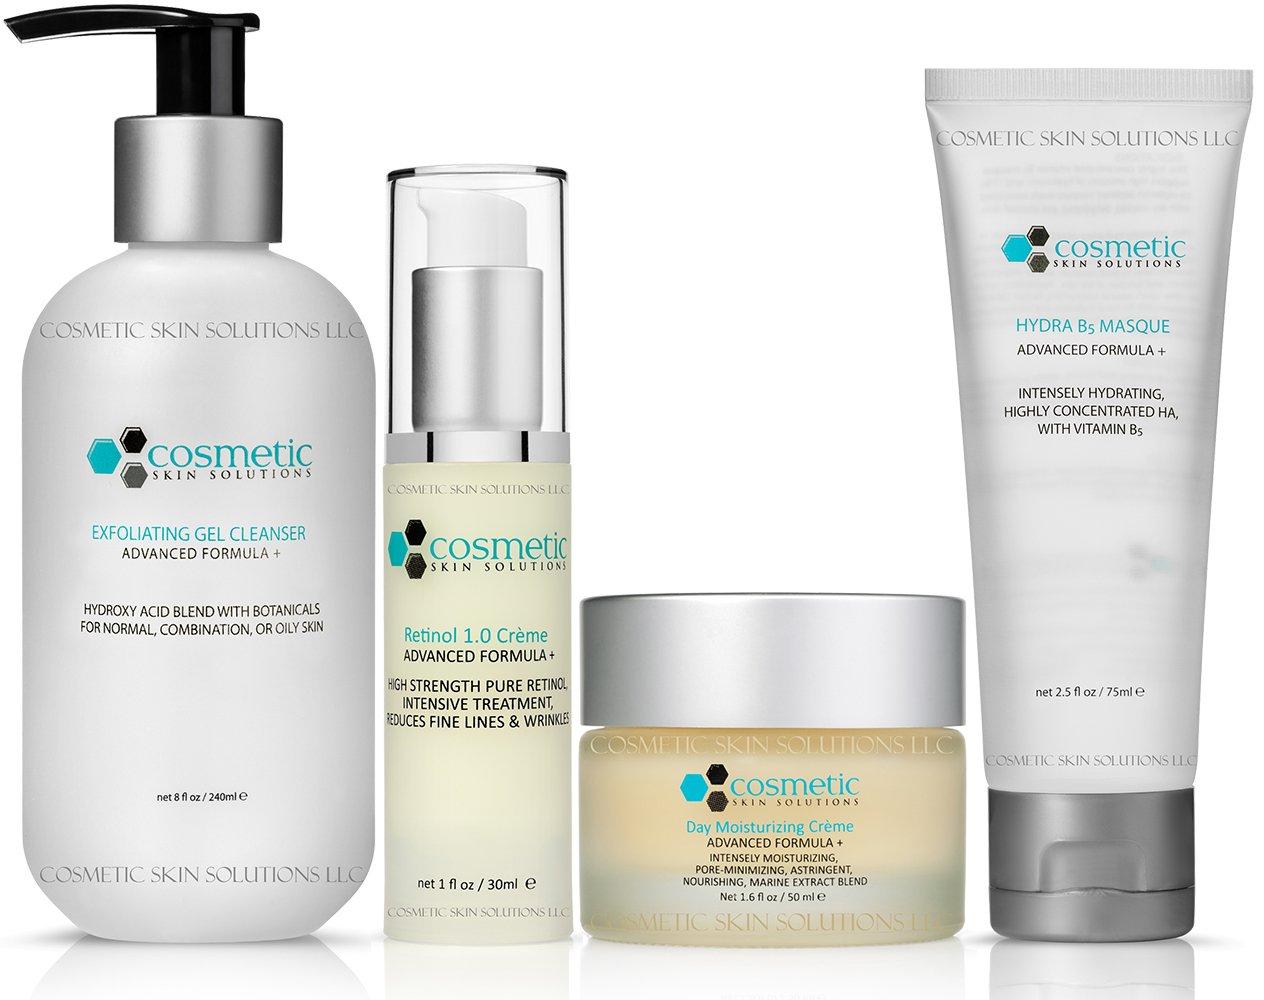 Cleanse | Correct | Moisturize | Masque - 4 Combo Pack - Includes Luxurious Pore-refining Cleanser (8 oz), Retinol 1.0 (1 oz), Moisturizer (50g), B5 Masque, Advanced Formula for MAXIMUM Effectiveness, Evening Use, No Parabens or Oils!